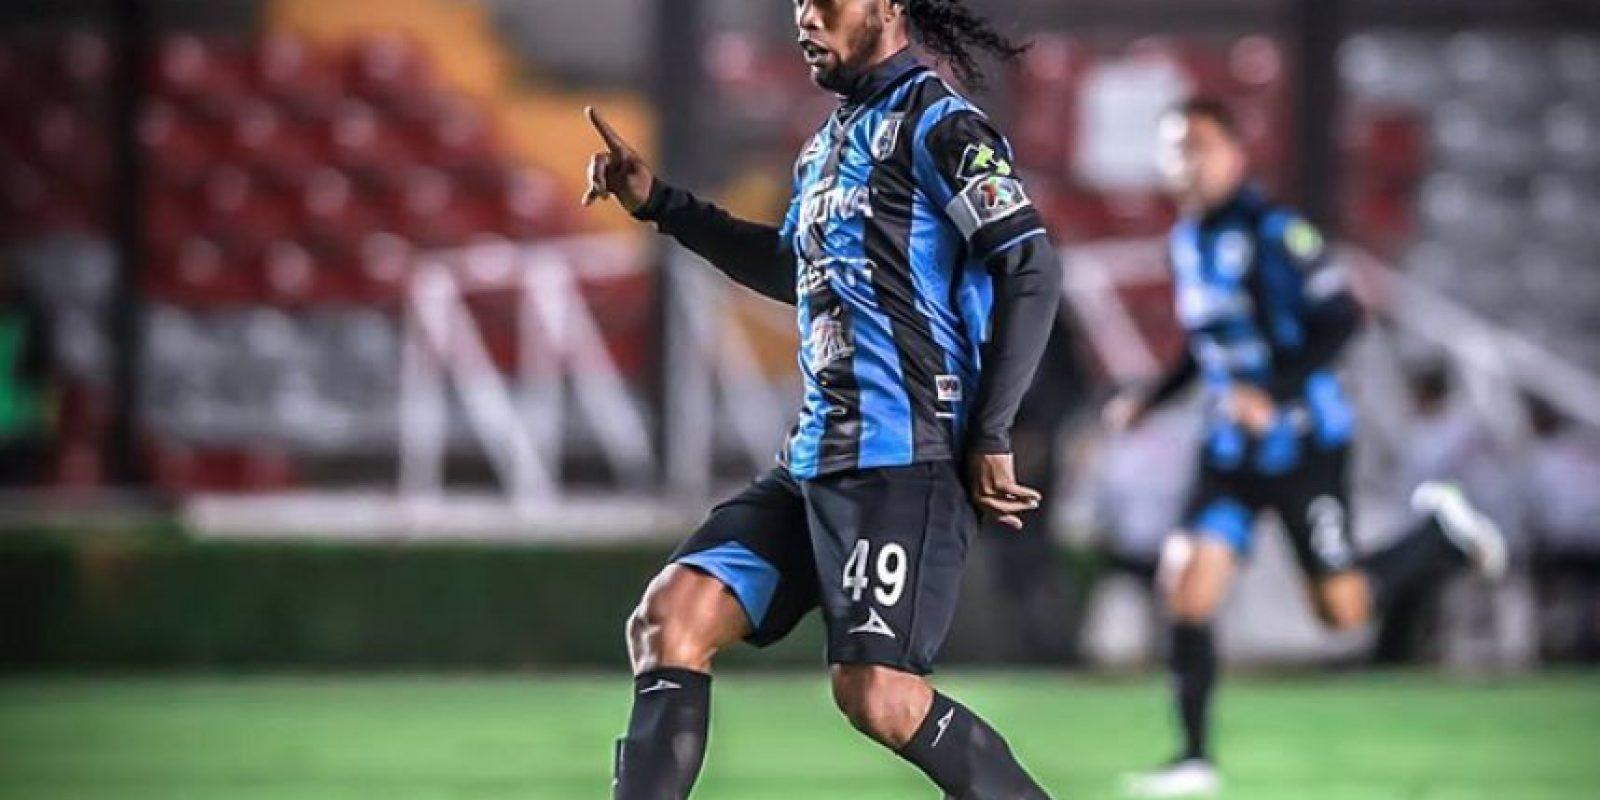 Solo ha marcado tres goles Foto:Facebook: Ronaldinho Gaúcho